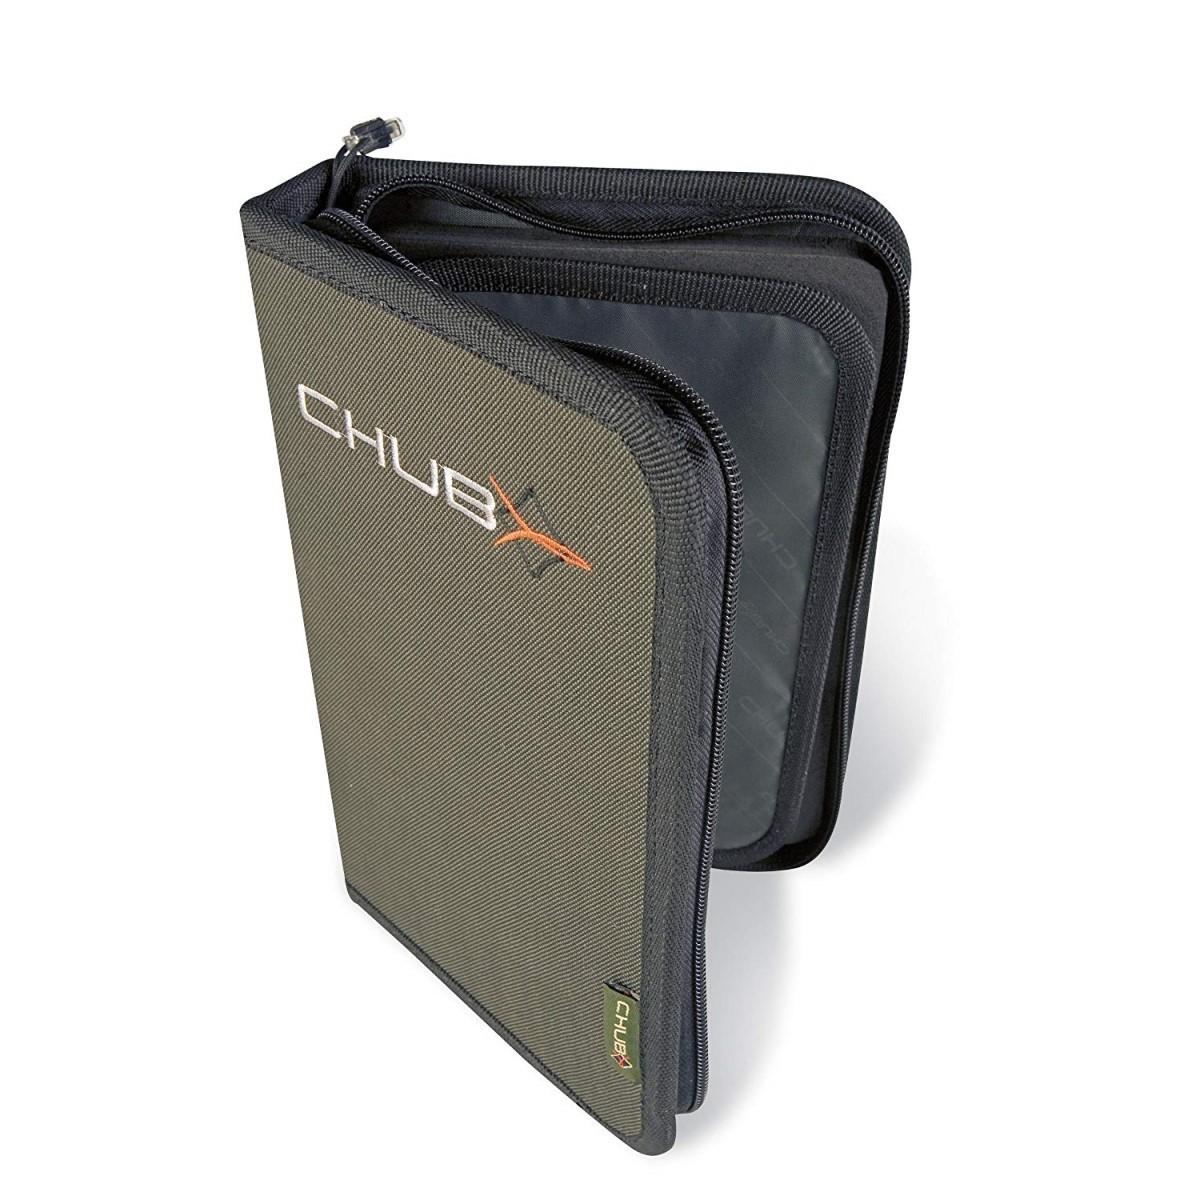 Класьор за поводи Chub Compact Rig Wallet